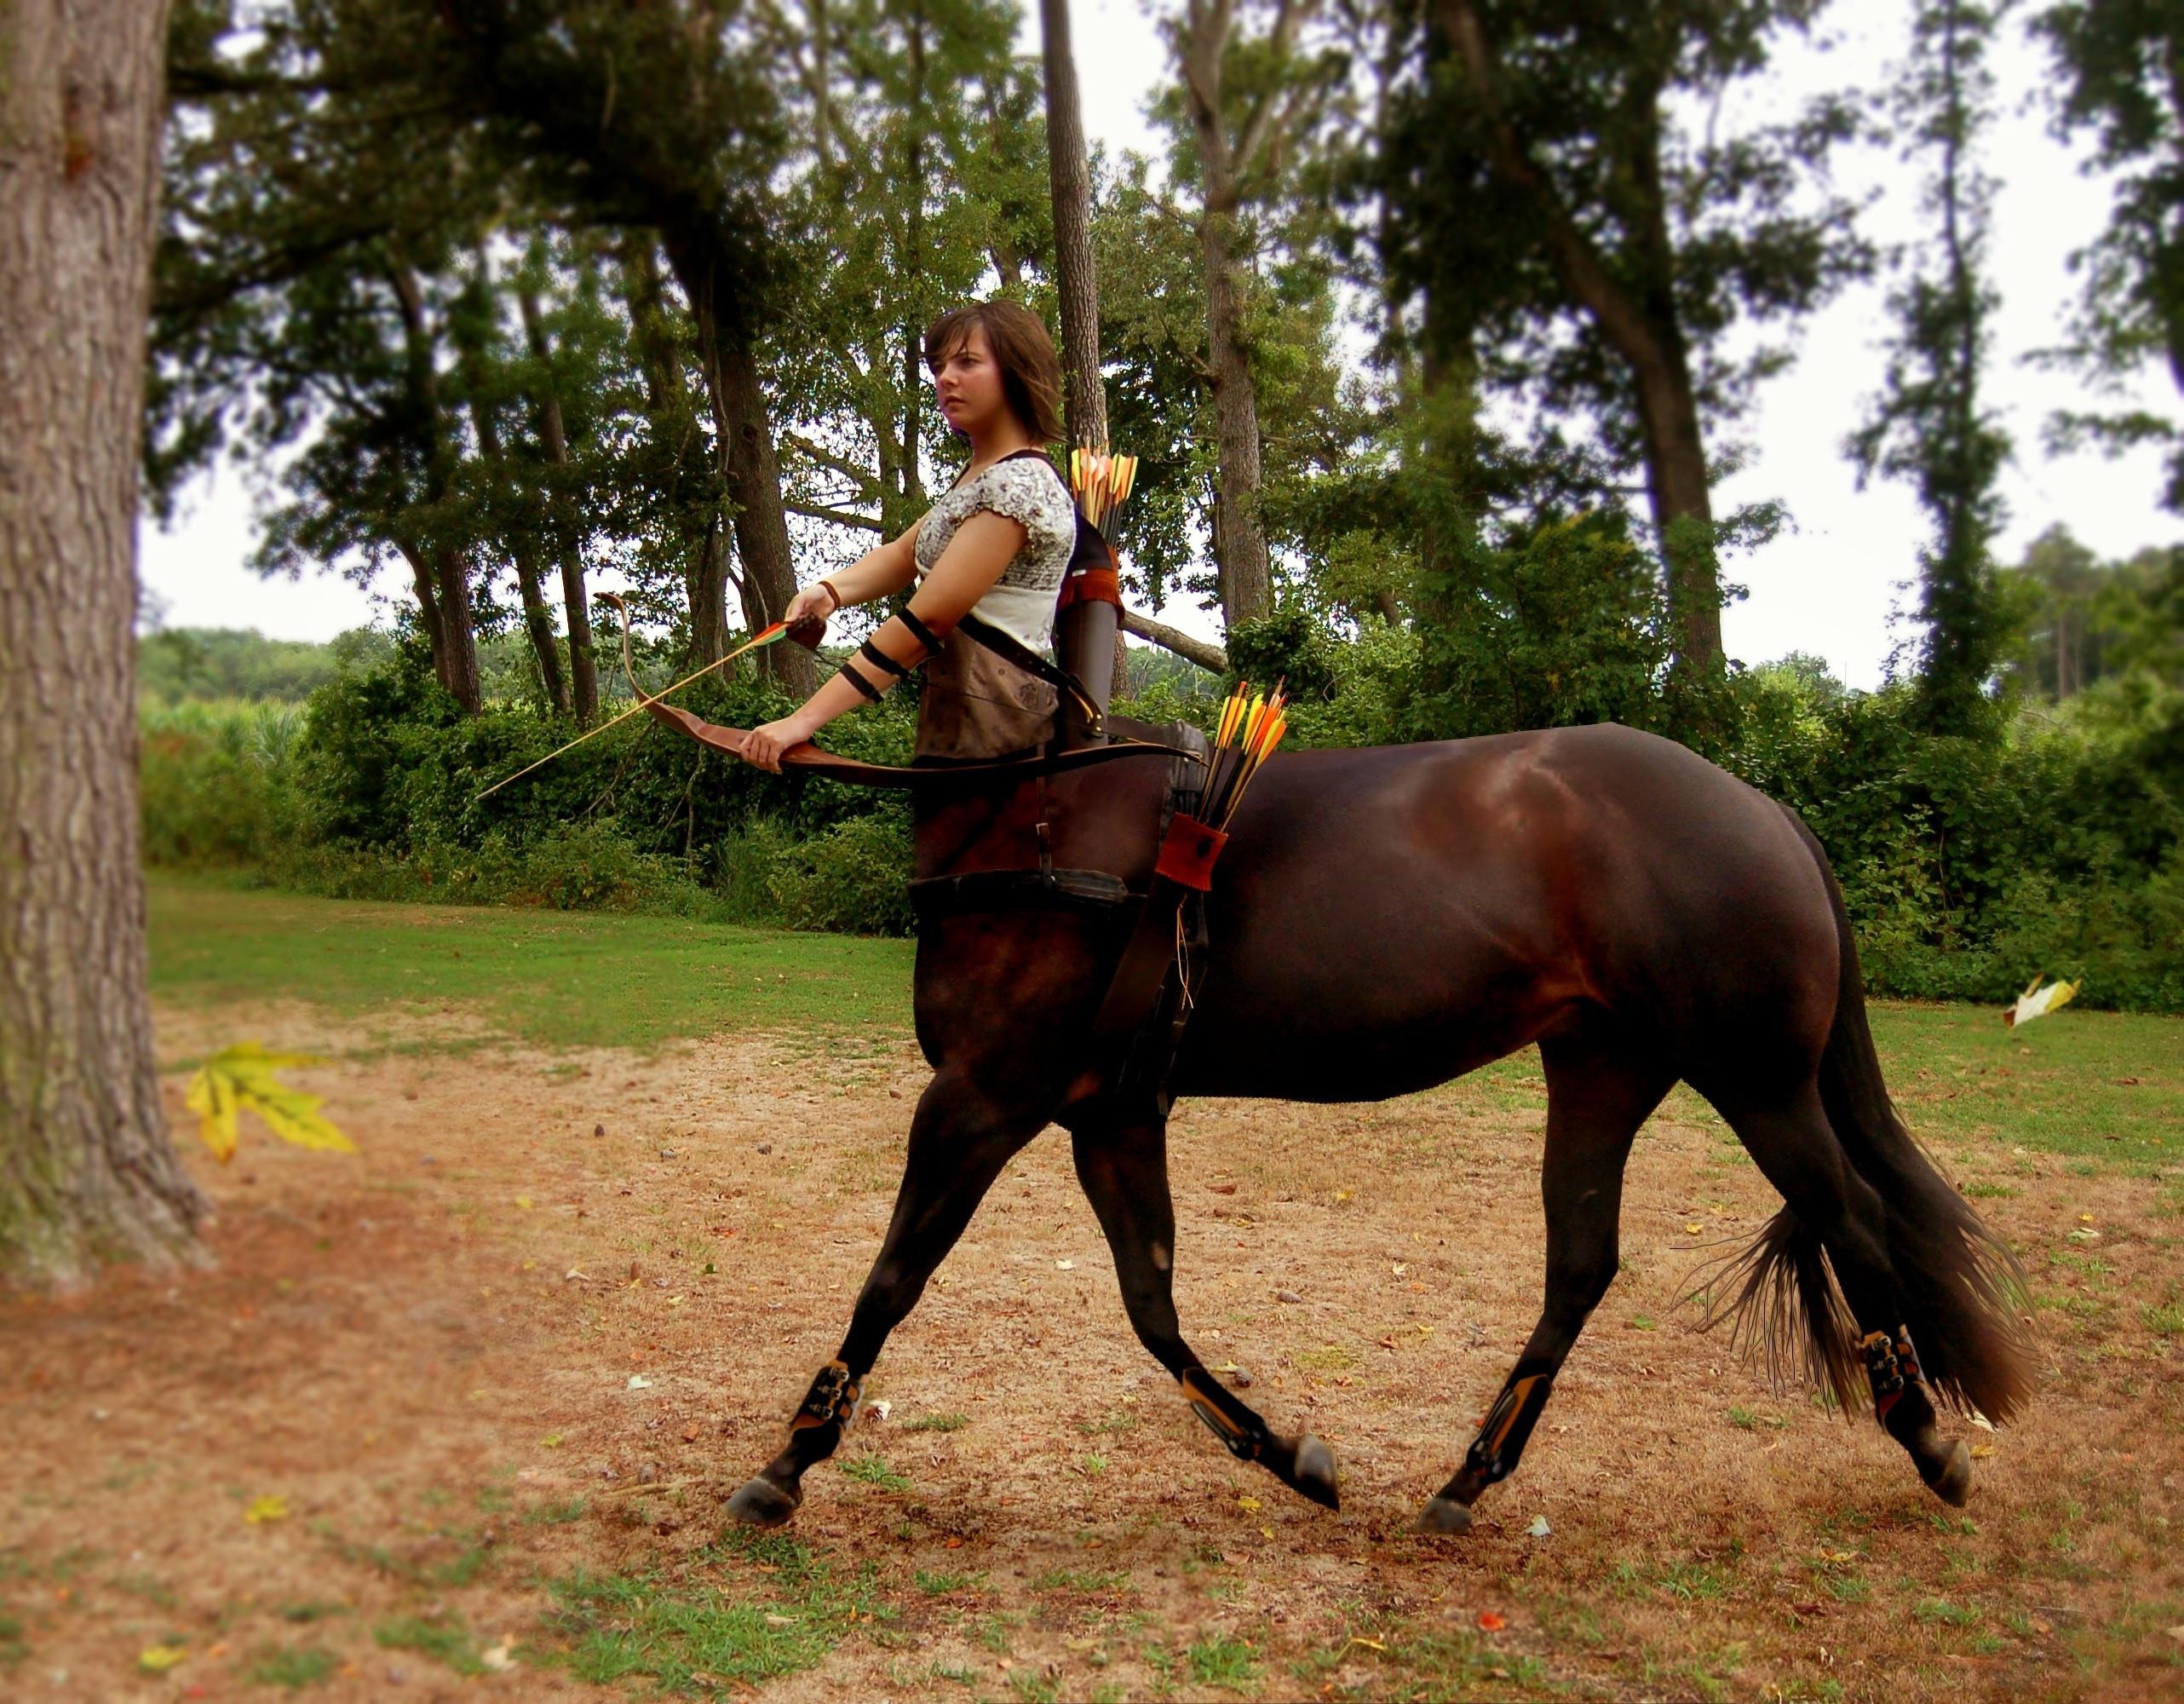 Centauress Protector by fares002 on DeviantArt